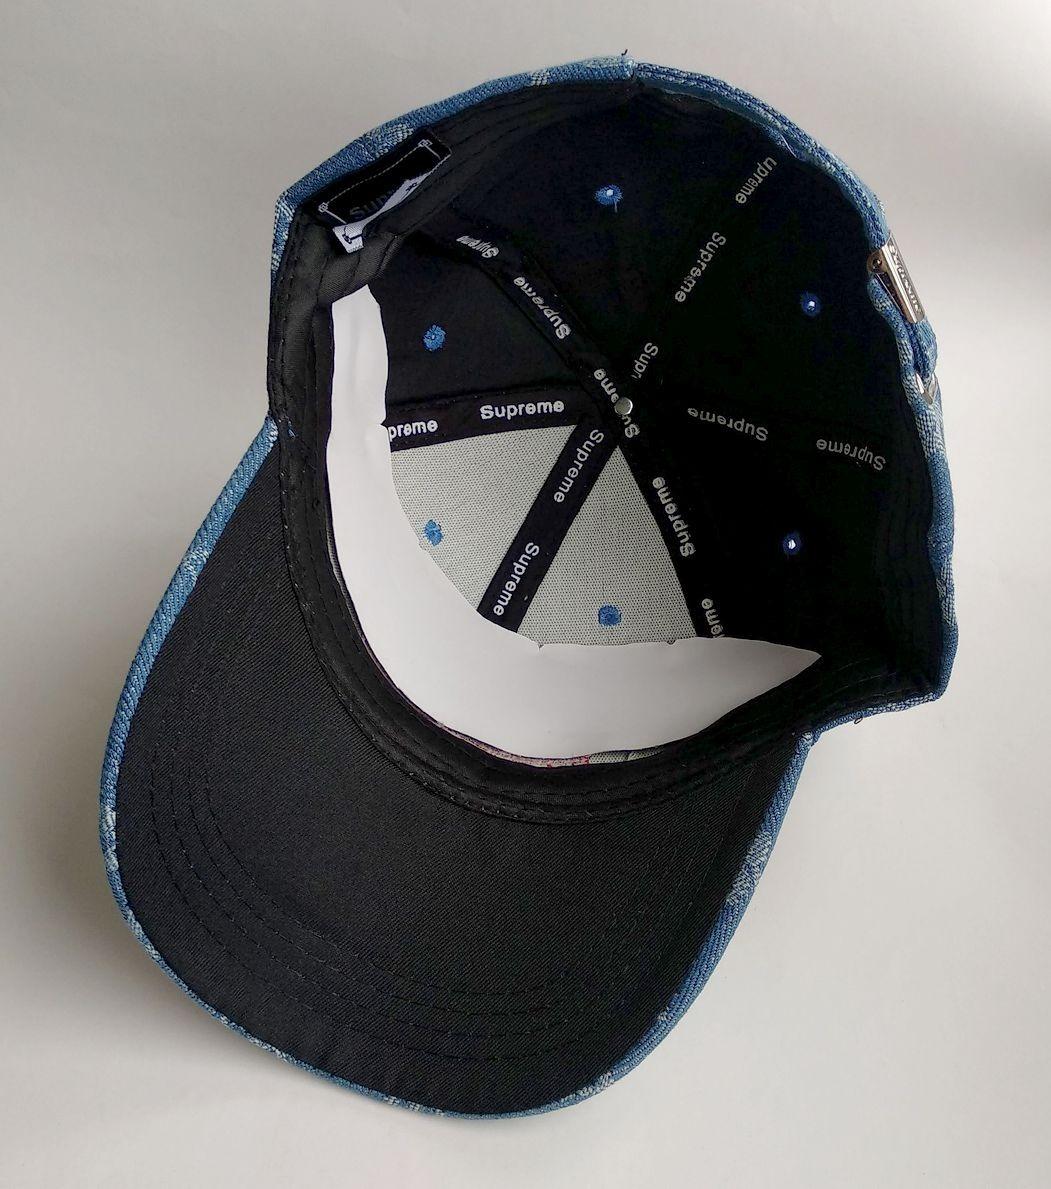 9097be599fb gorra supreme x lv polo 6 gajos dad hat strapback polo tommy. Cargando zoom.